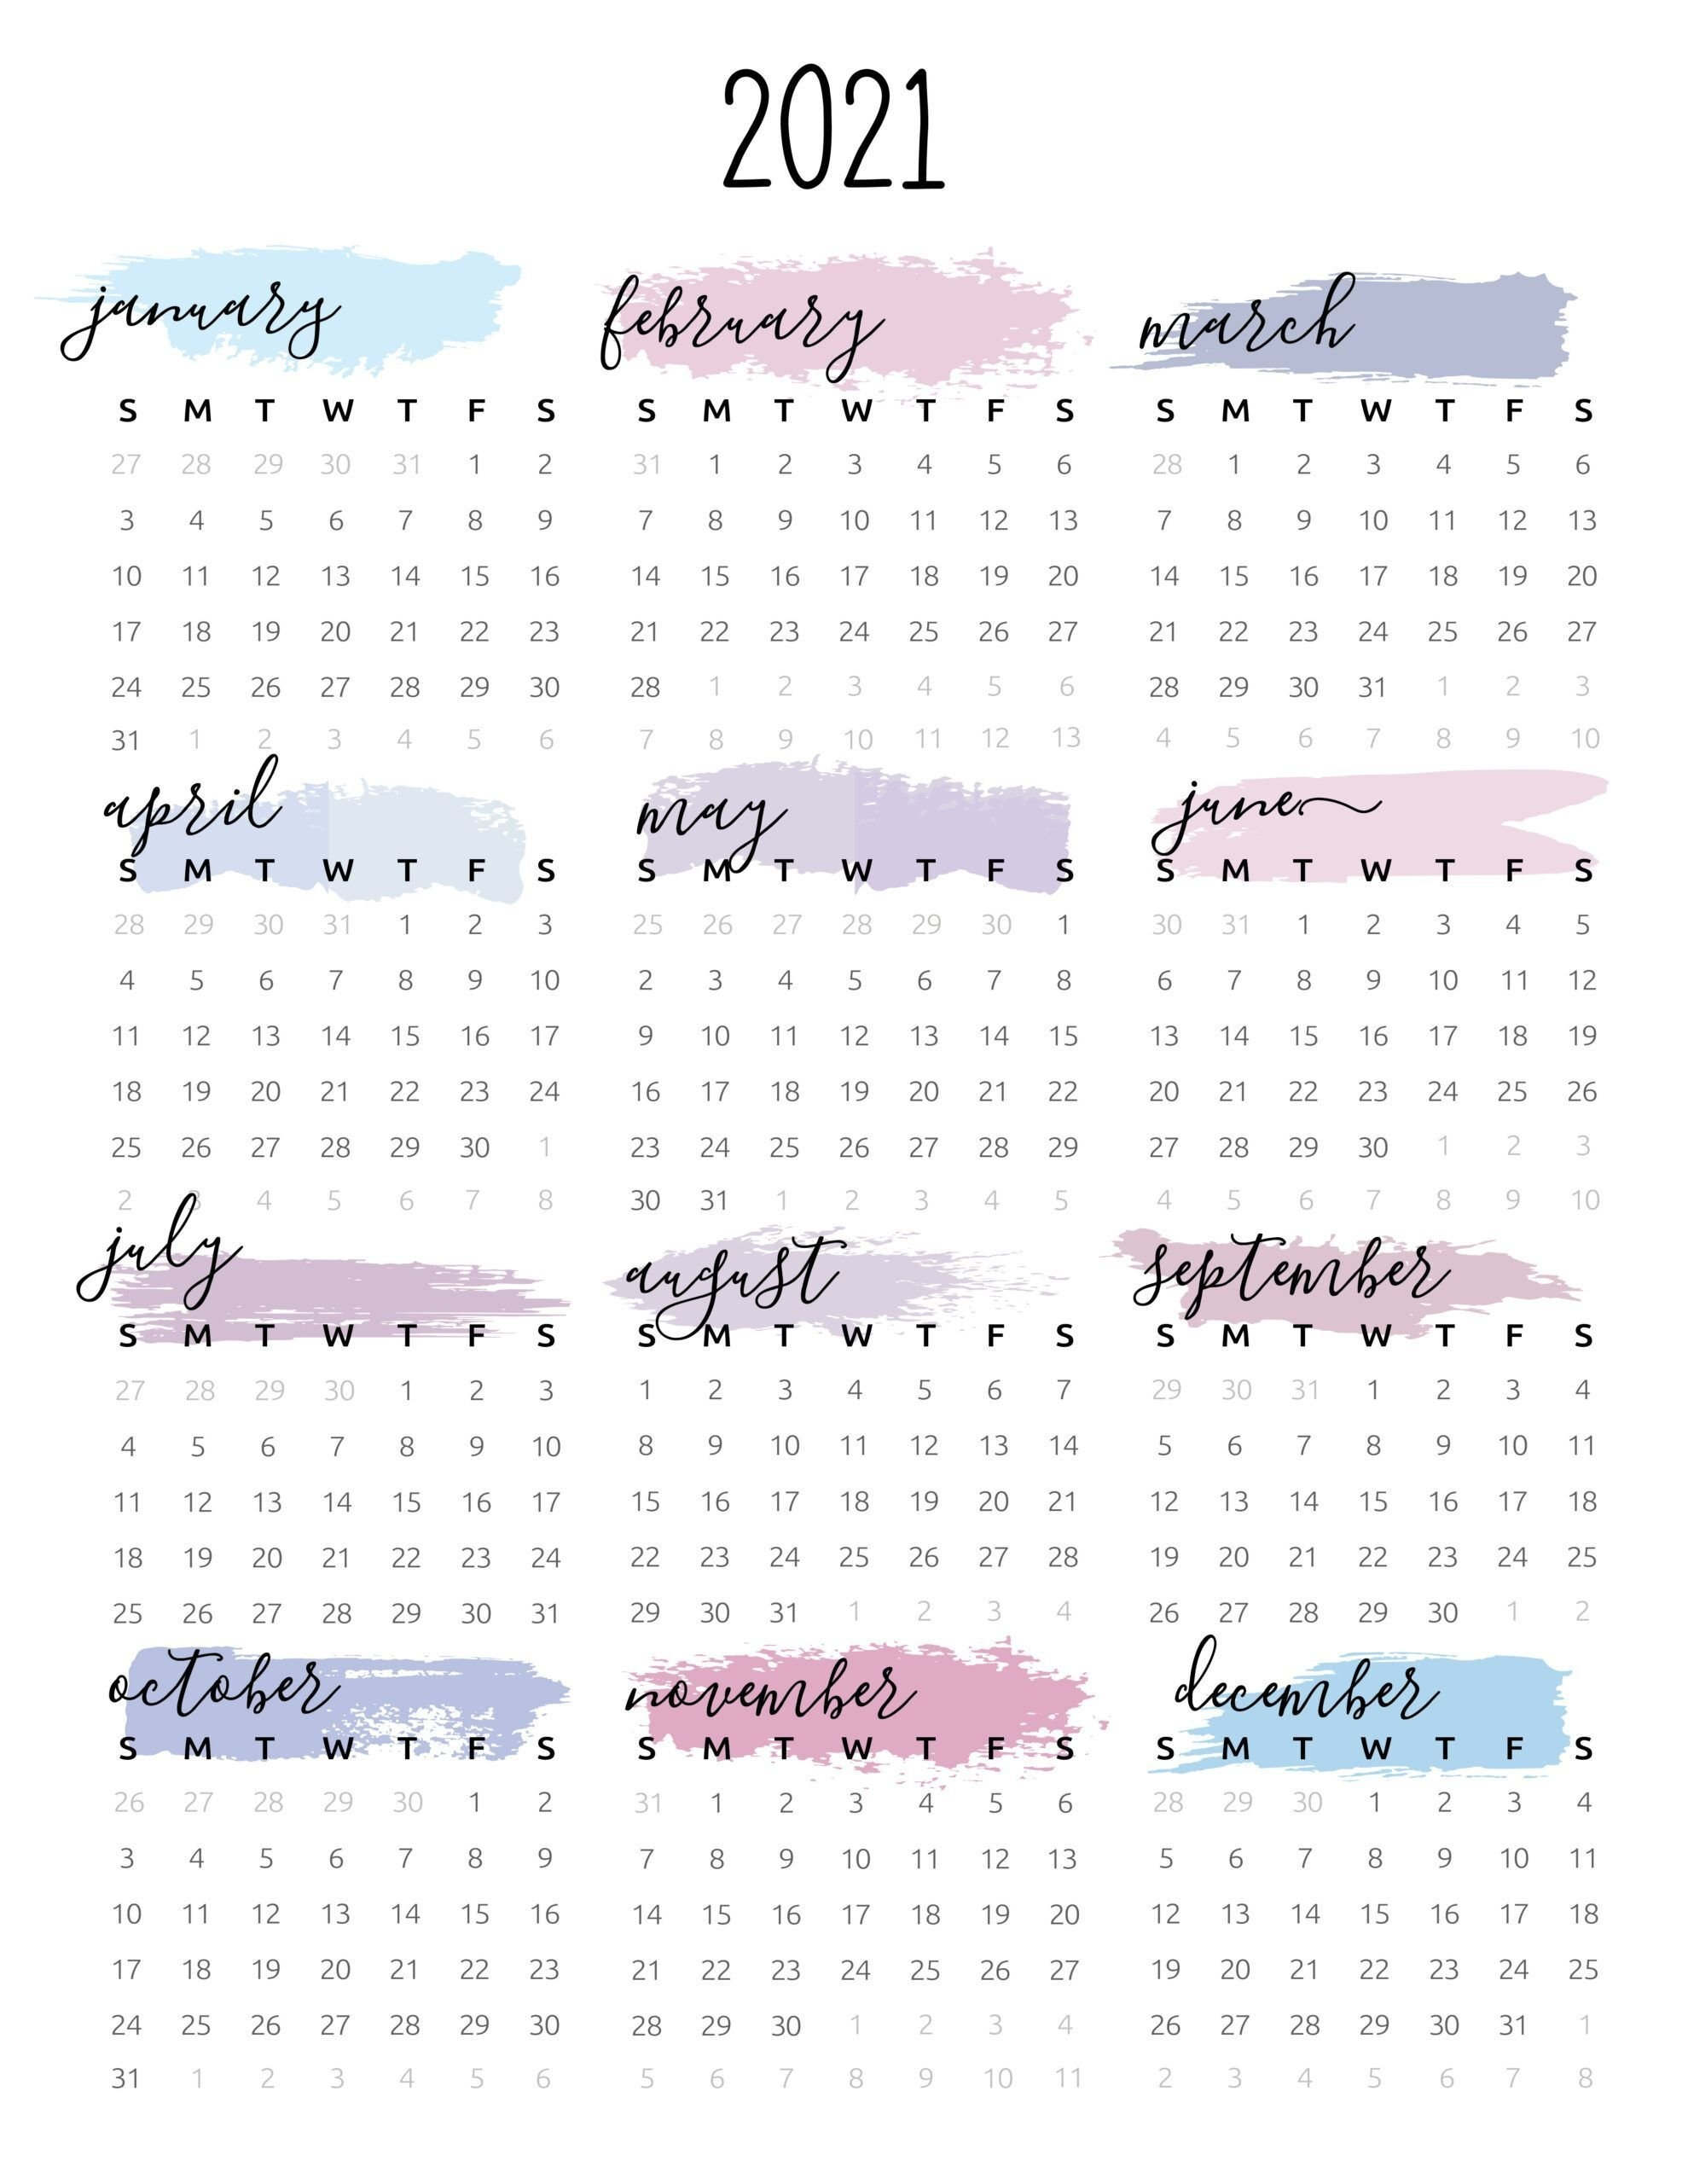 2021 Calendar Templates Editableword : Editable Calendar 2021 / Choose From Over A Hundred with regard to Free Printable Calendarlabs 2021